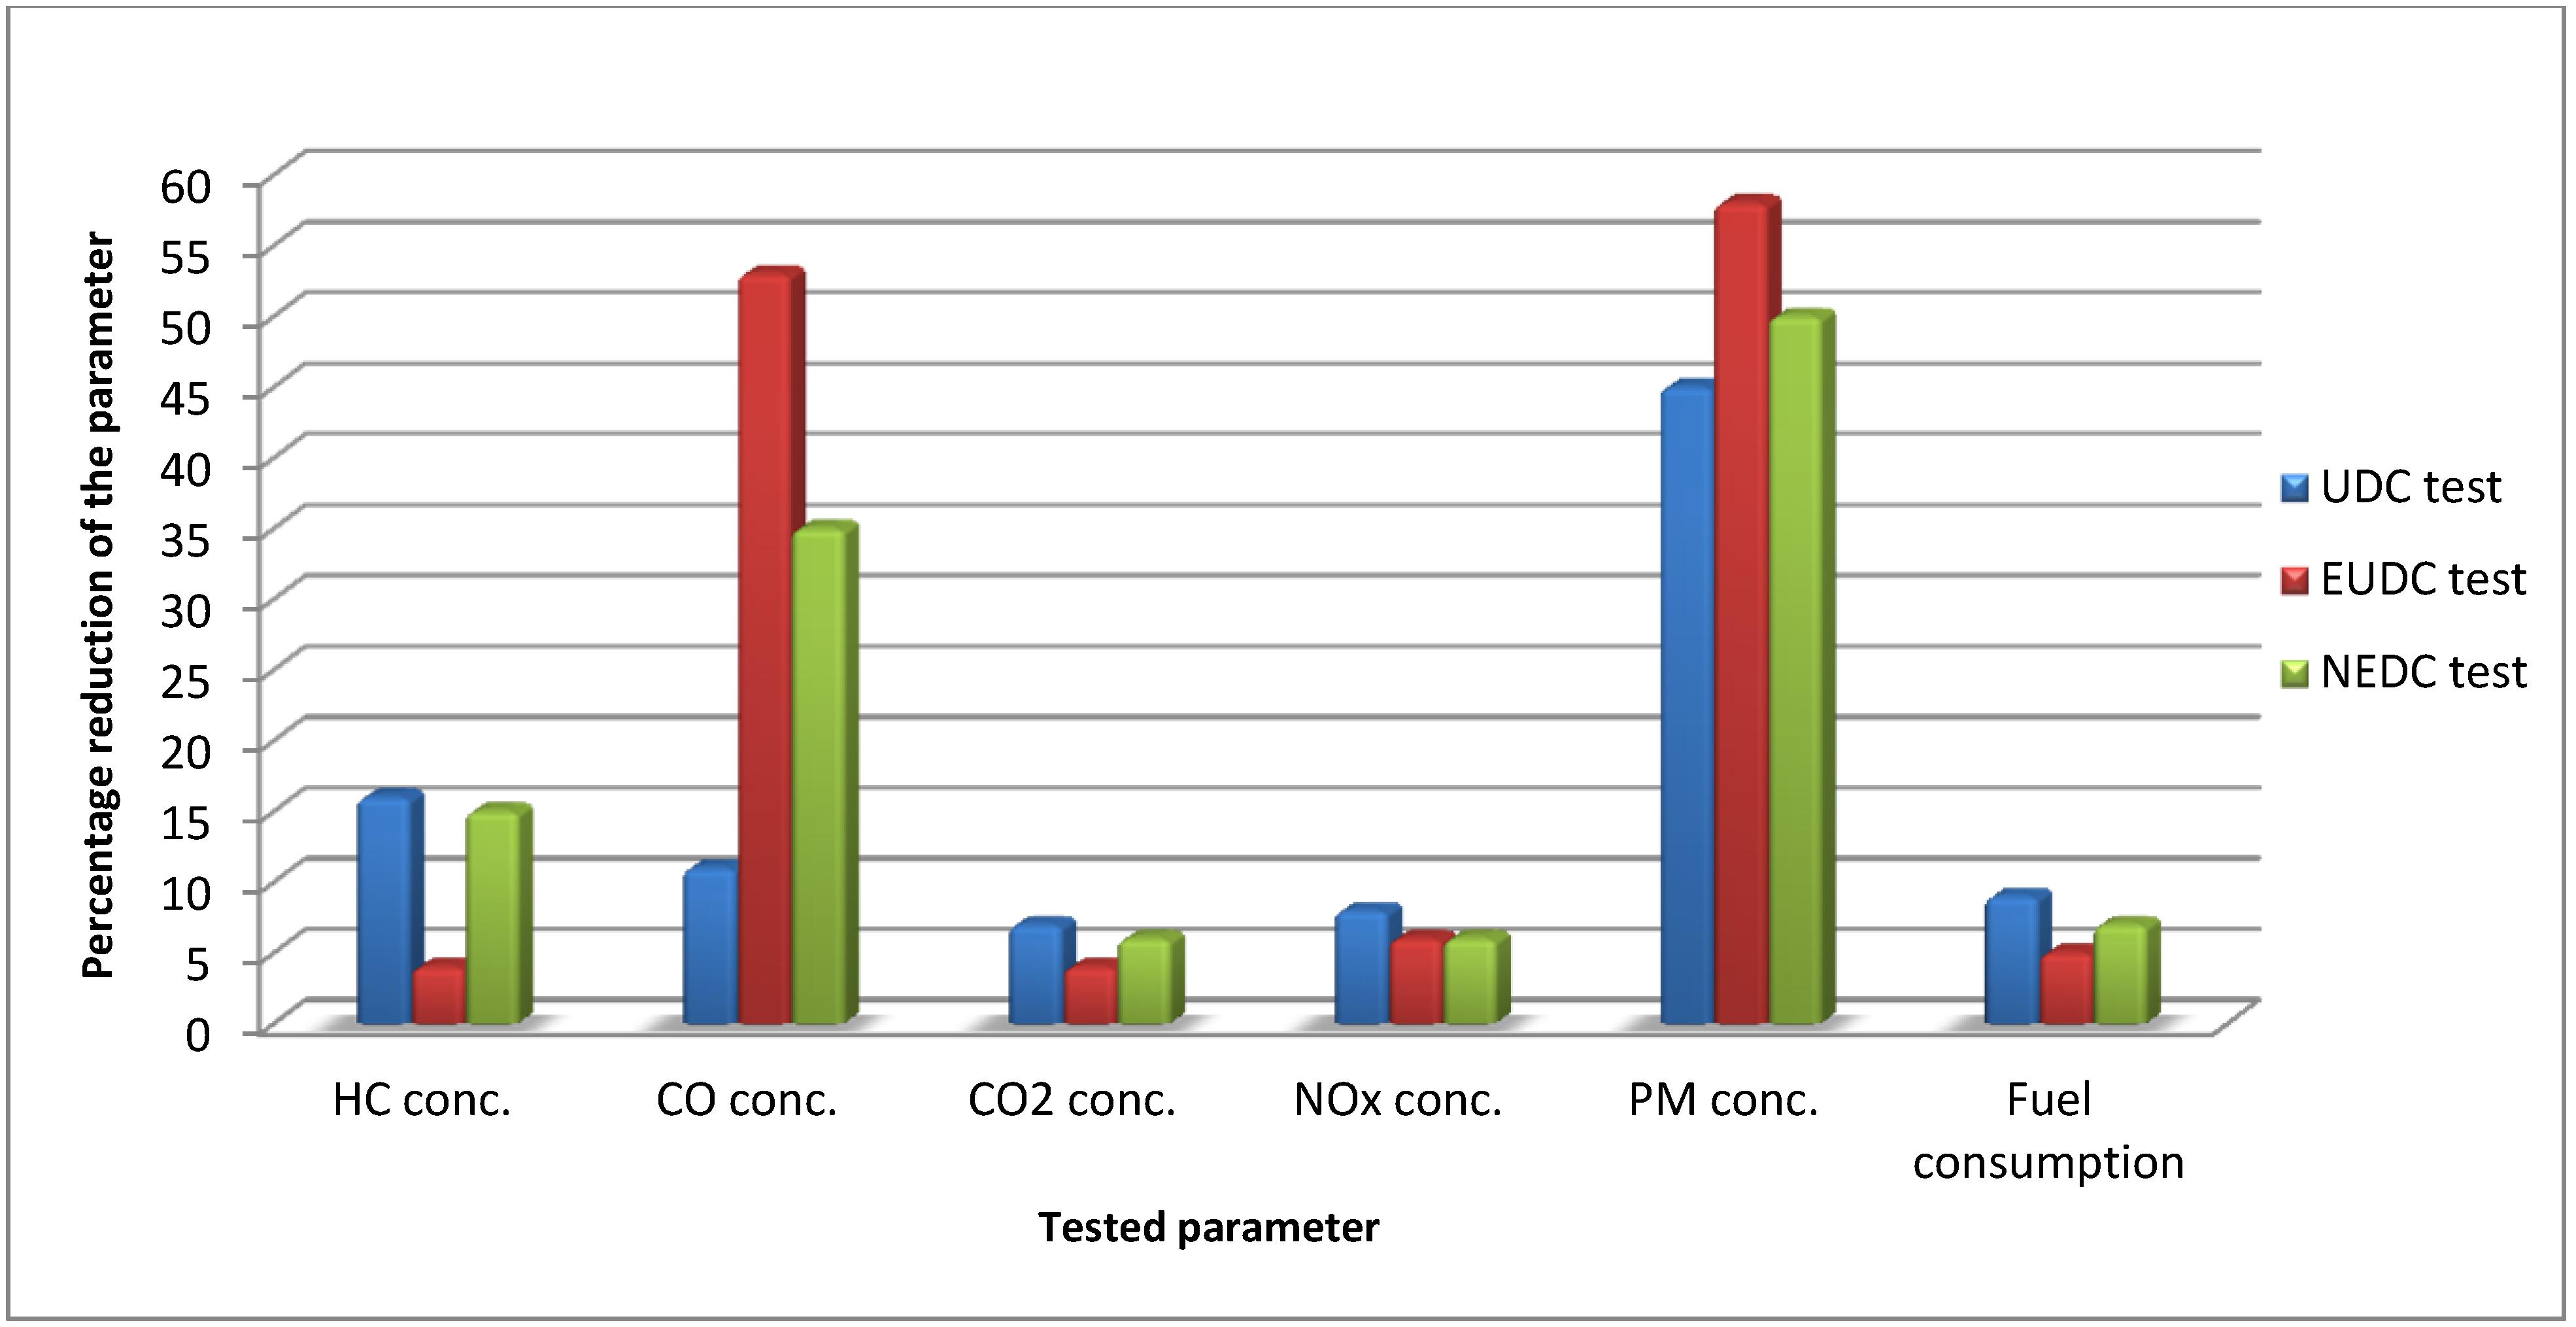 Liquefied Petroleum Gas Lpg As A Fuel For Internal Combustion Engine Block Diagram The Diesel Has Figure 8